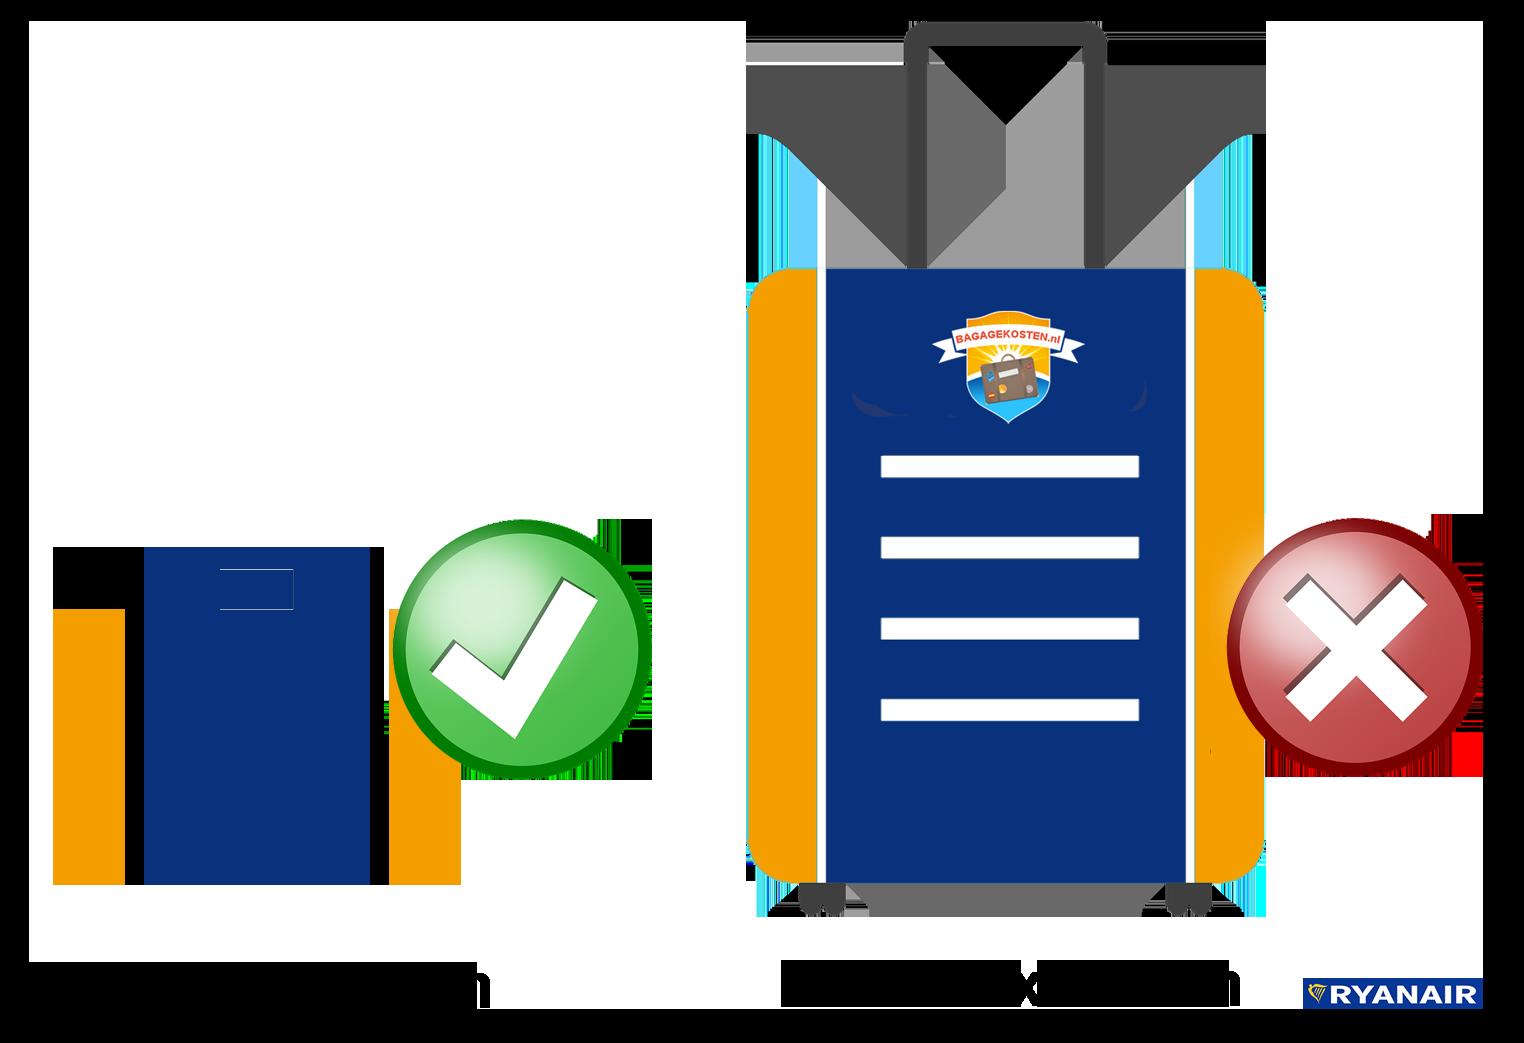 Ryanair handbagage afmetingen